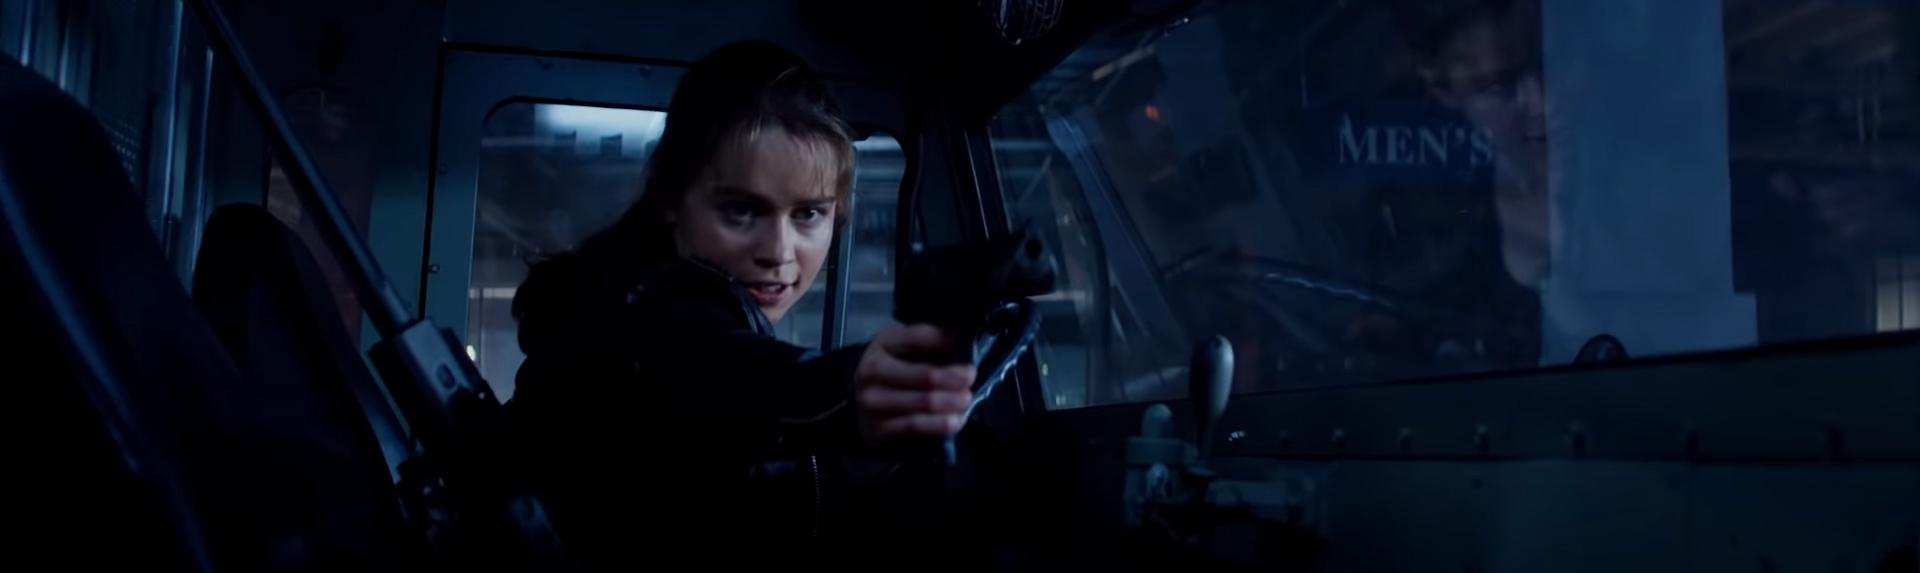 Terminator Genisys. Image Credit: Paramount.